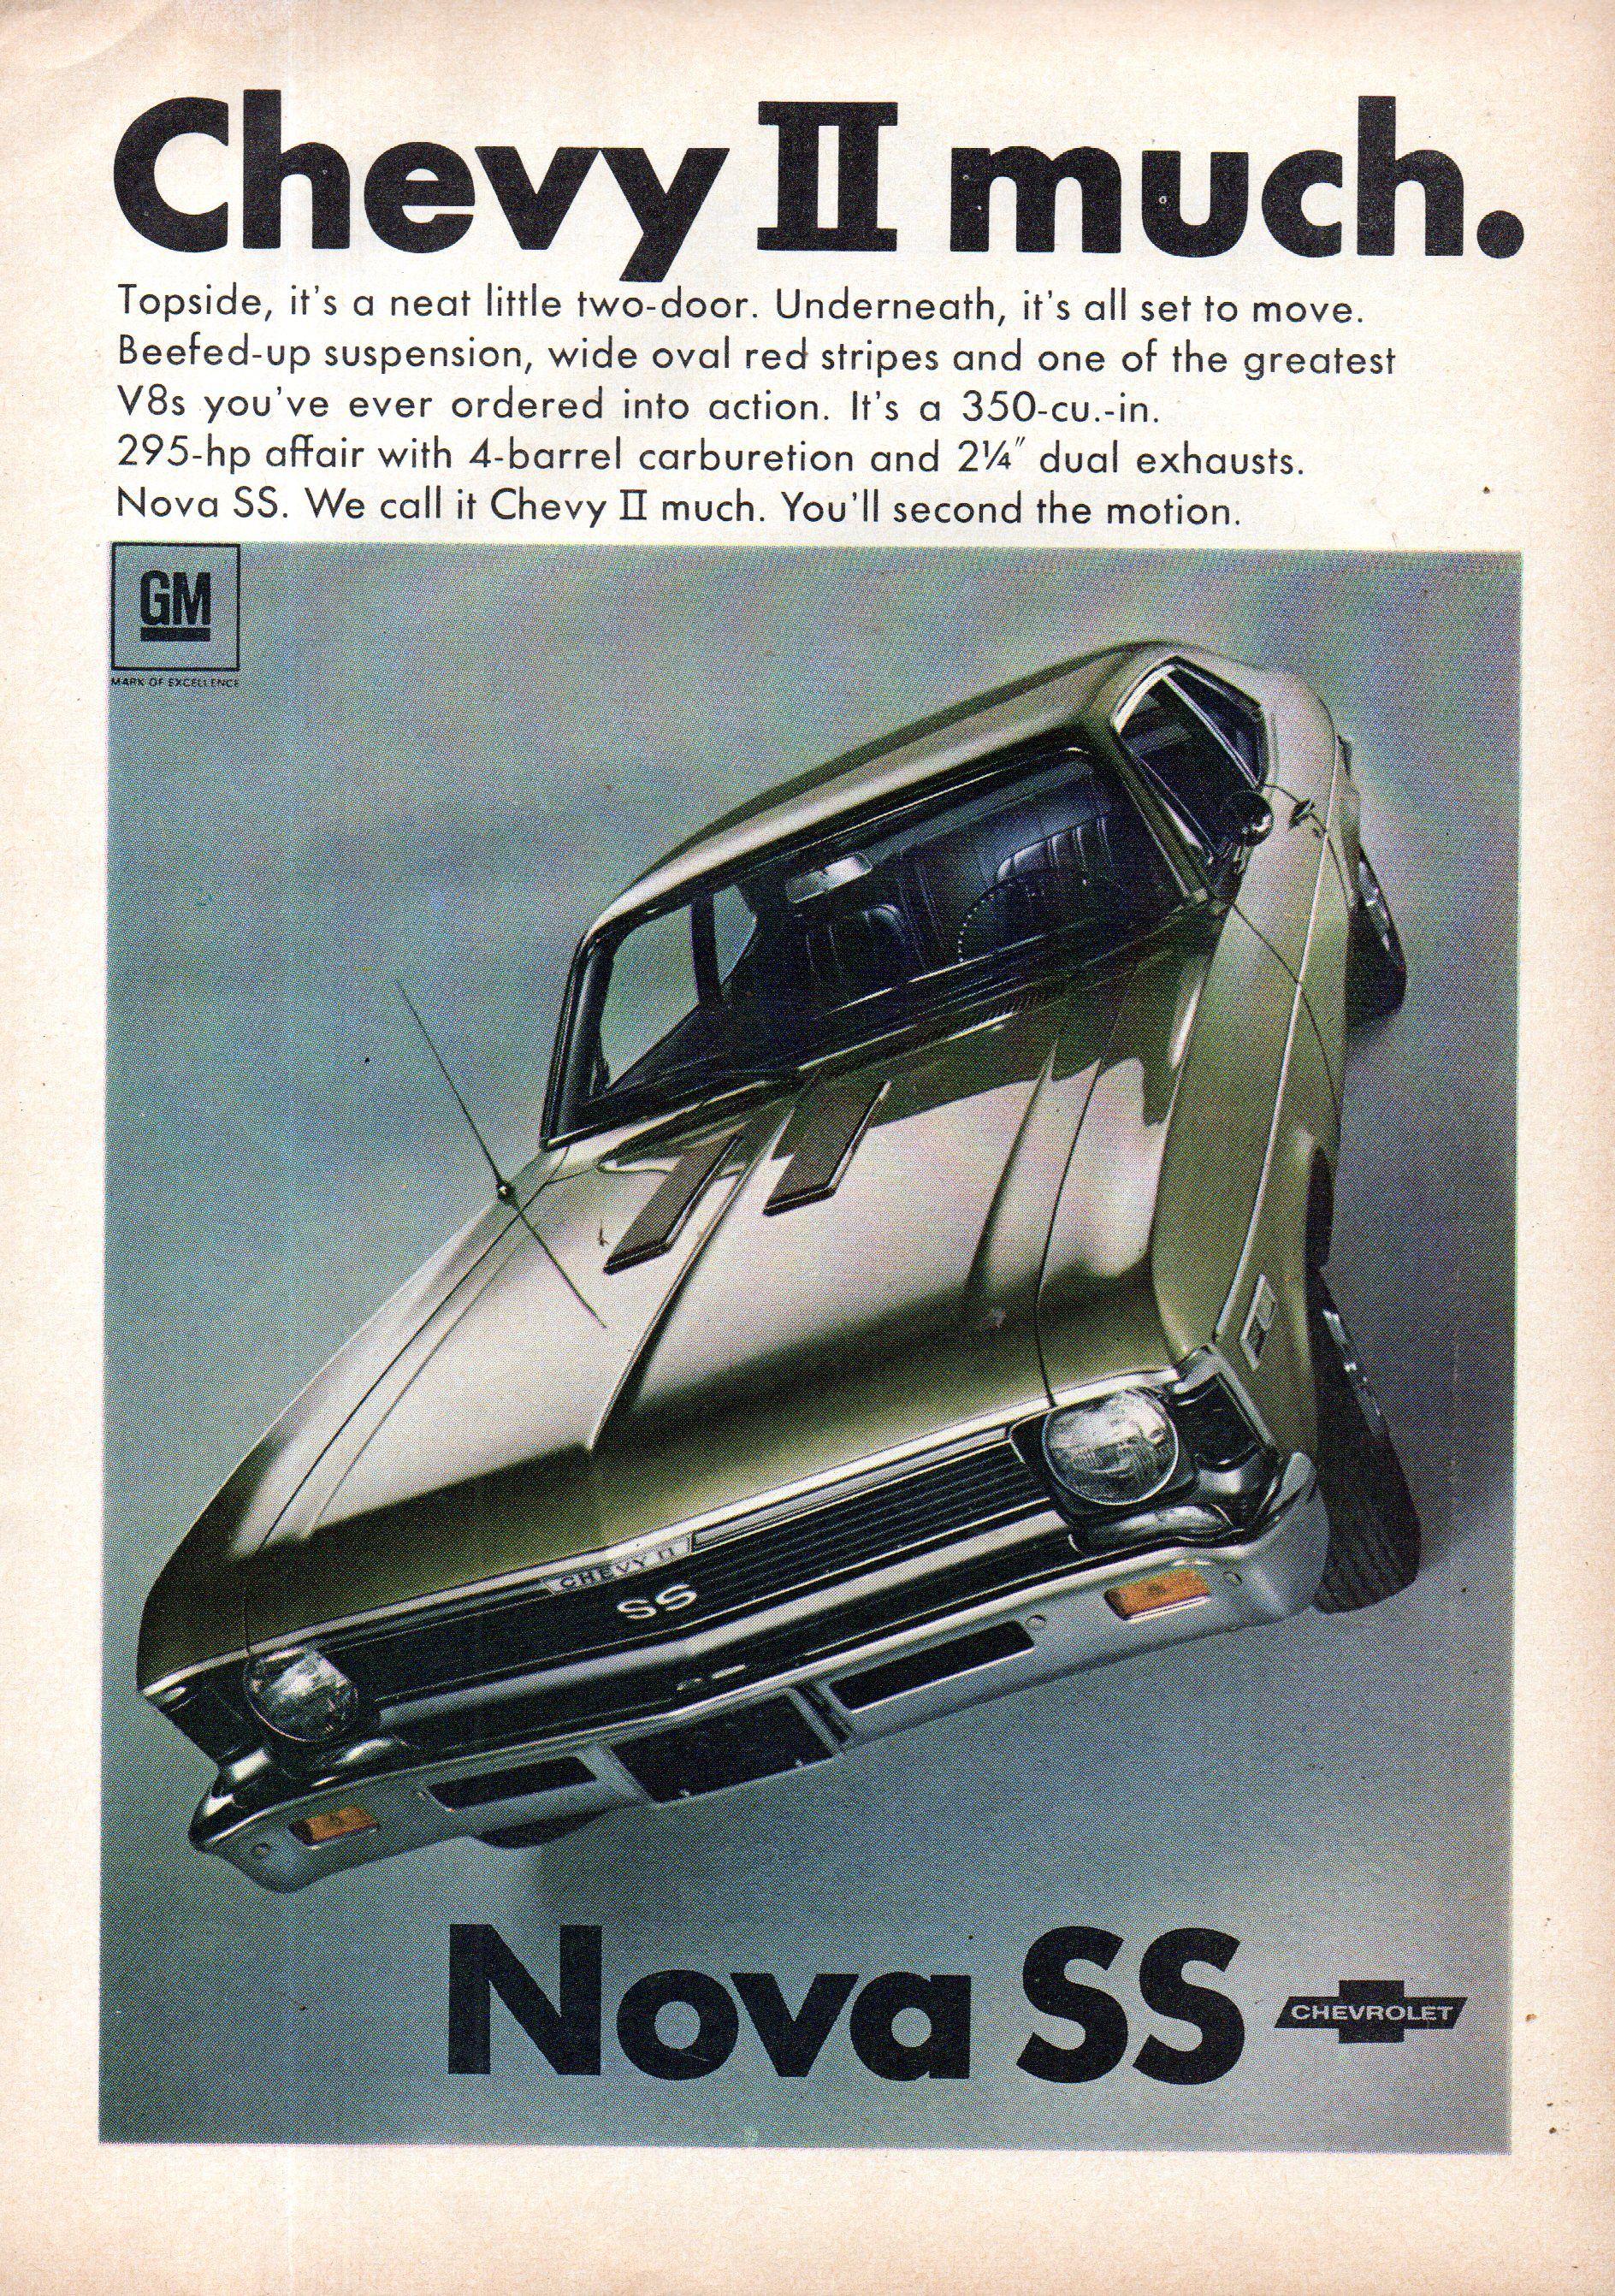 1968 Chevrolet Chevy II Nova SS Coupe USA Original Magazine Advertisement